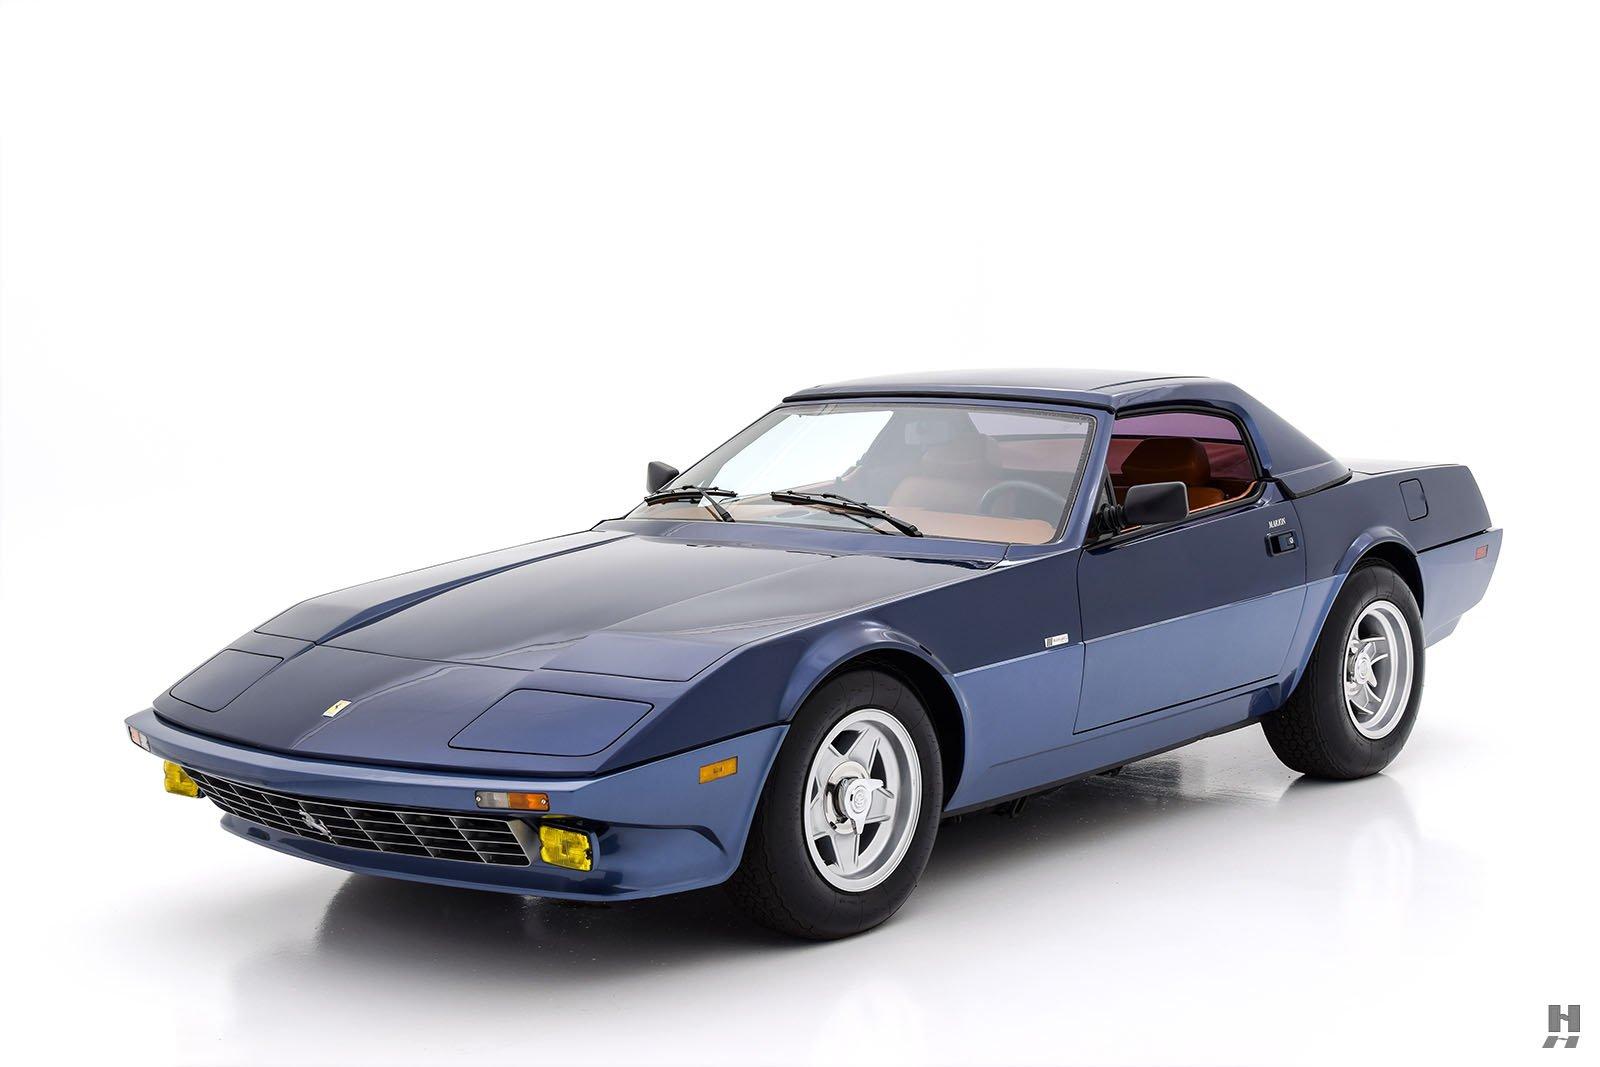 1971 Ferrari 365 GTB/4 NART Spyder For Sale at Hyman LTD